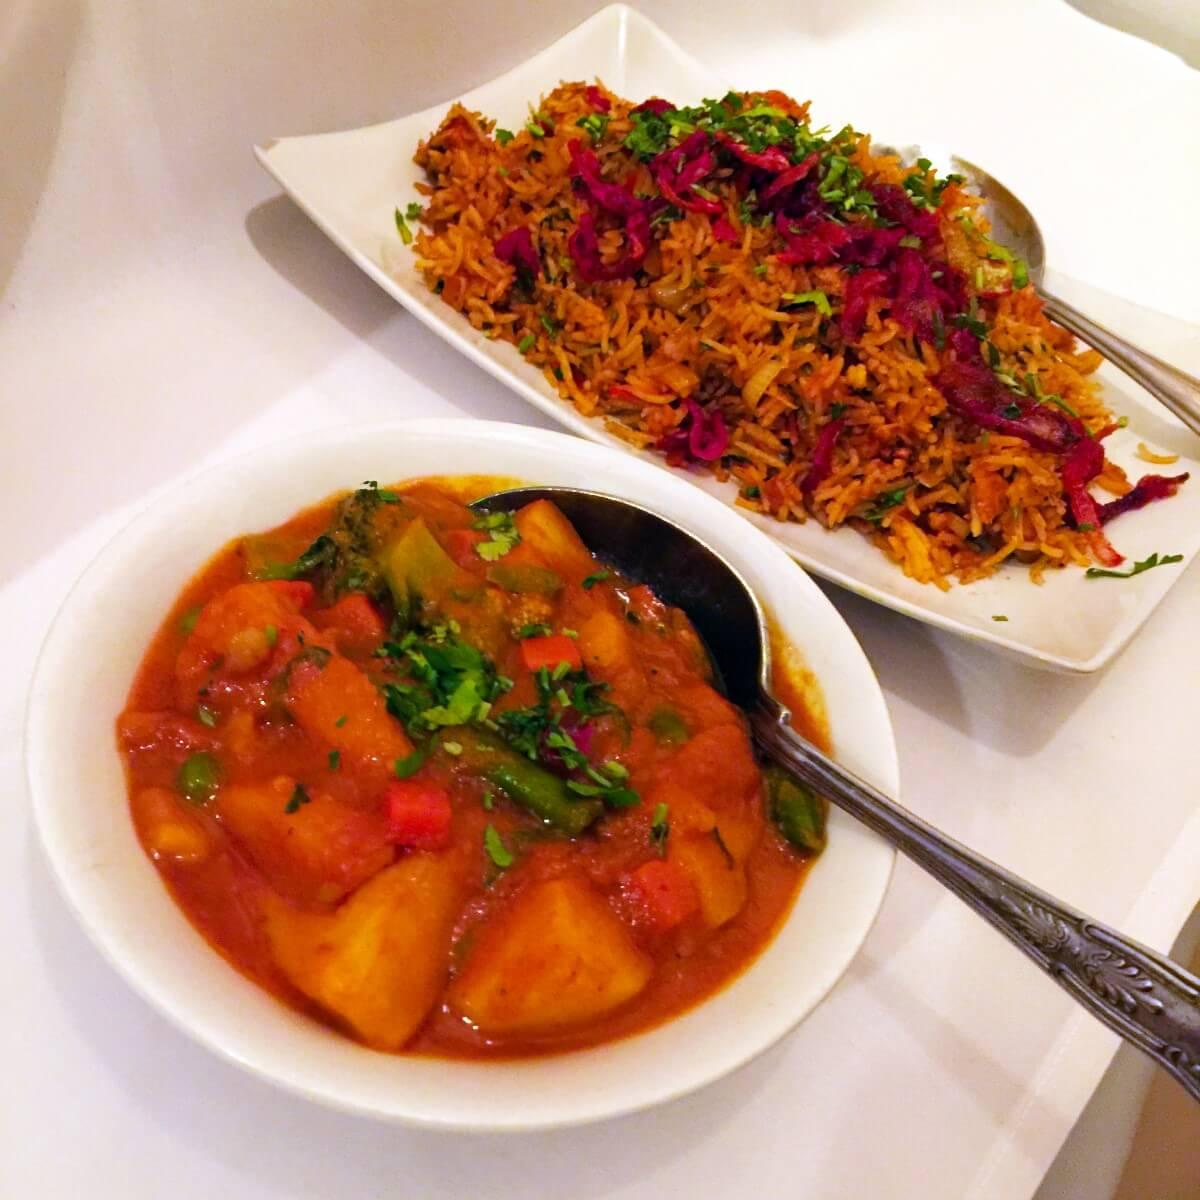 5. Gandhi's Indian Restaurant and Takeaway